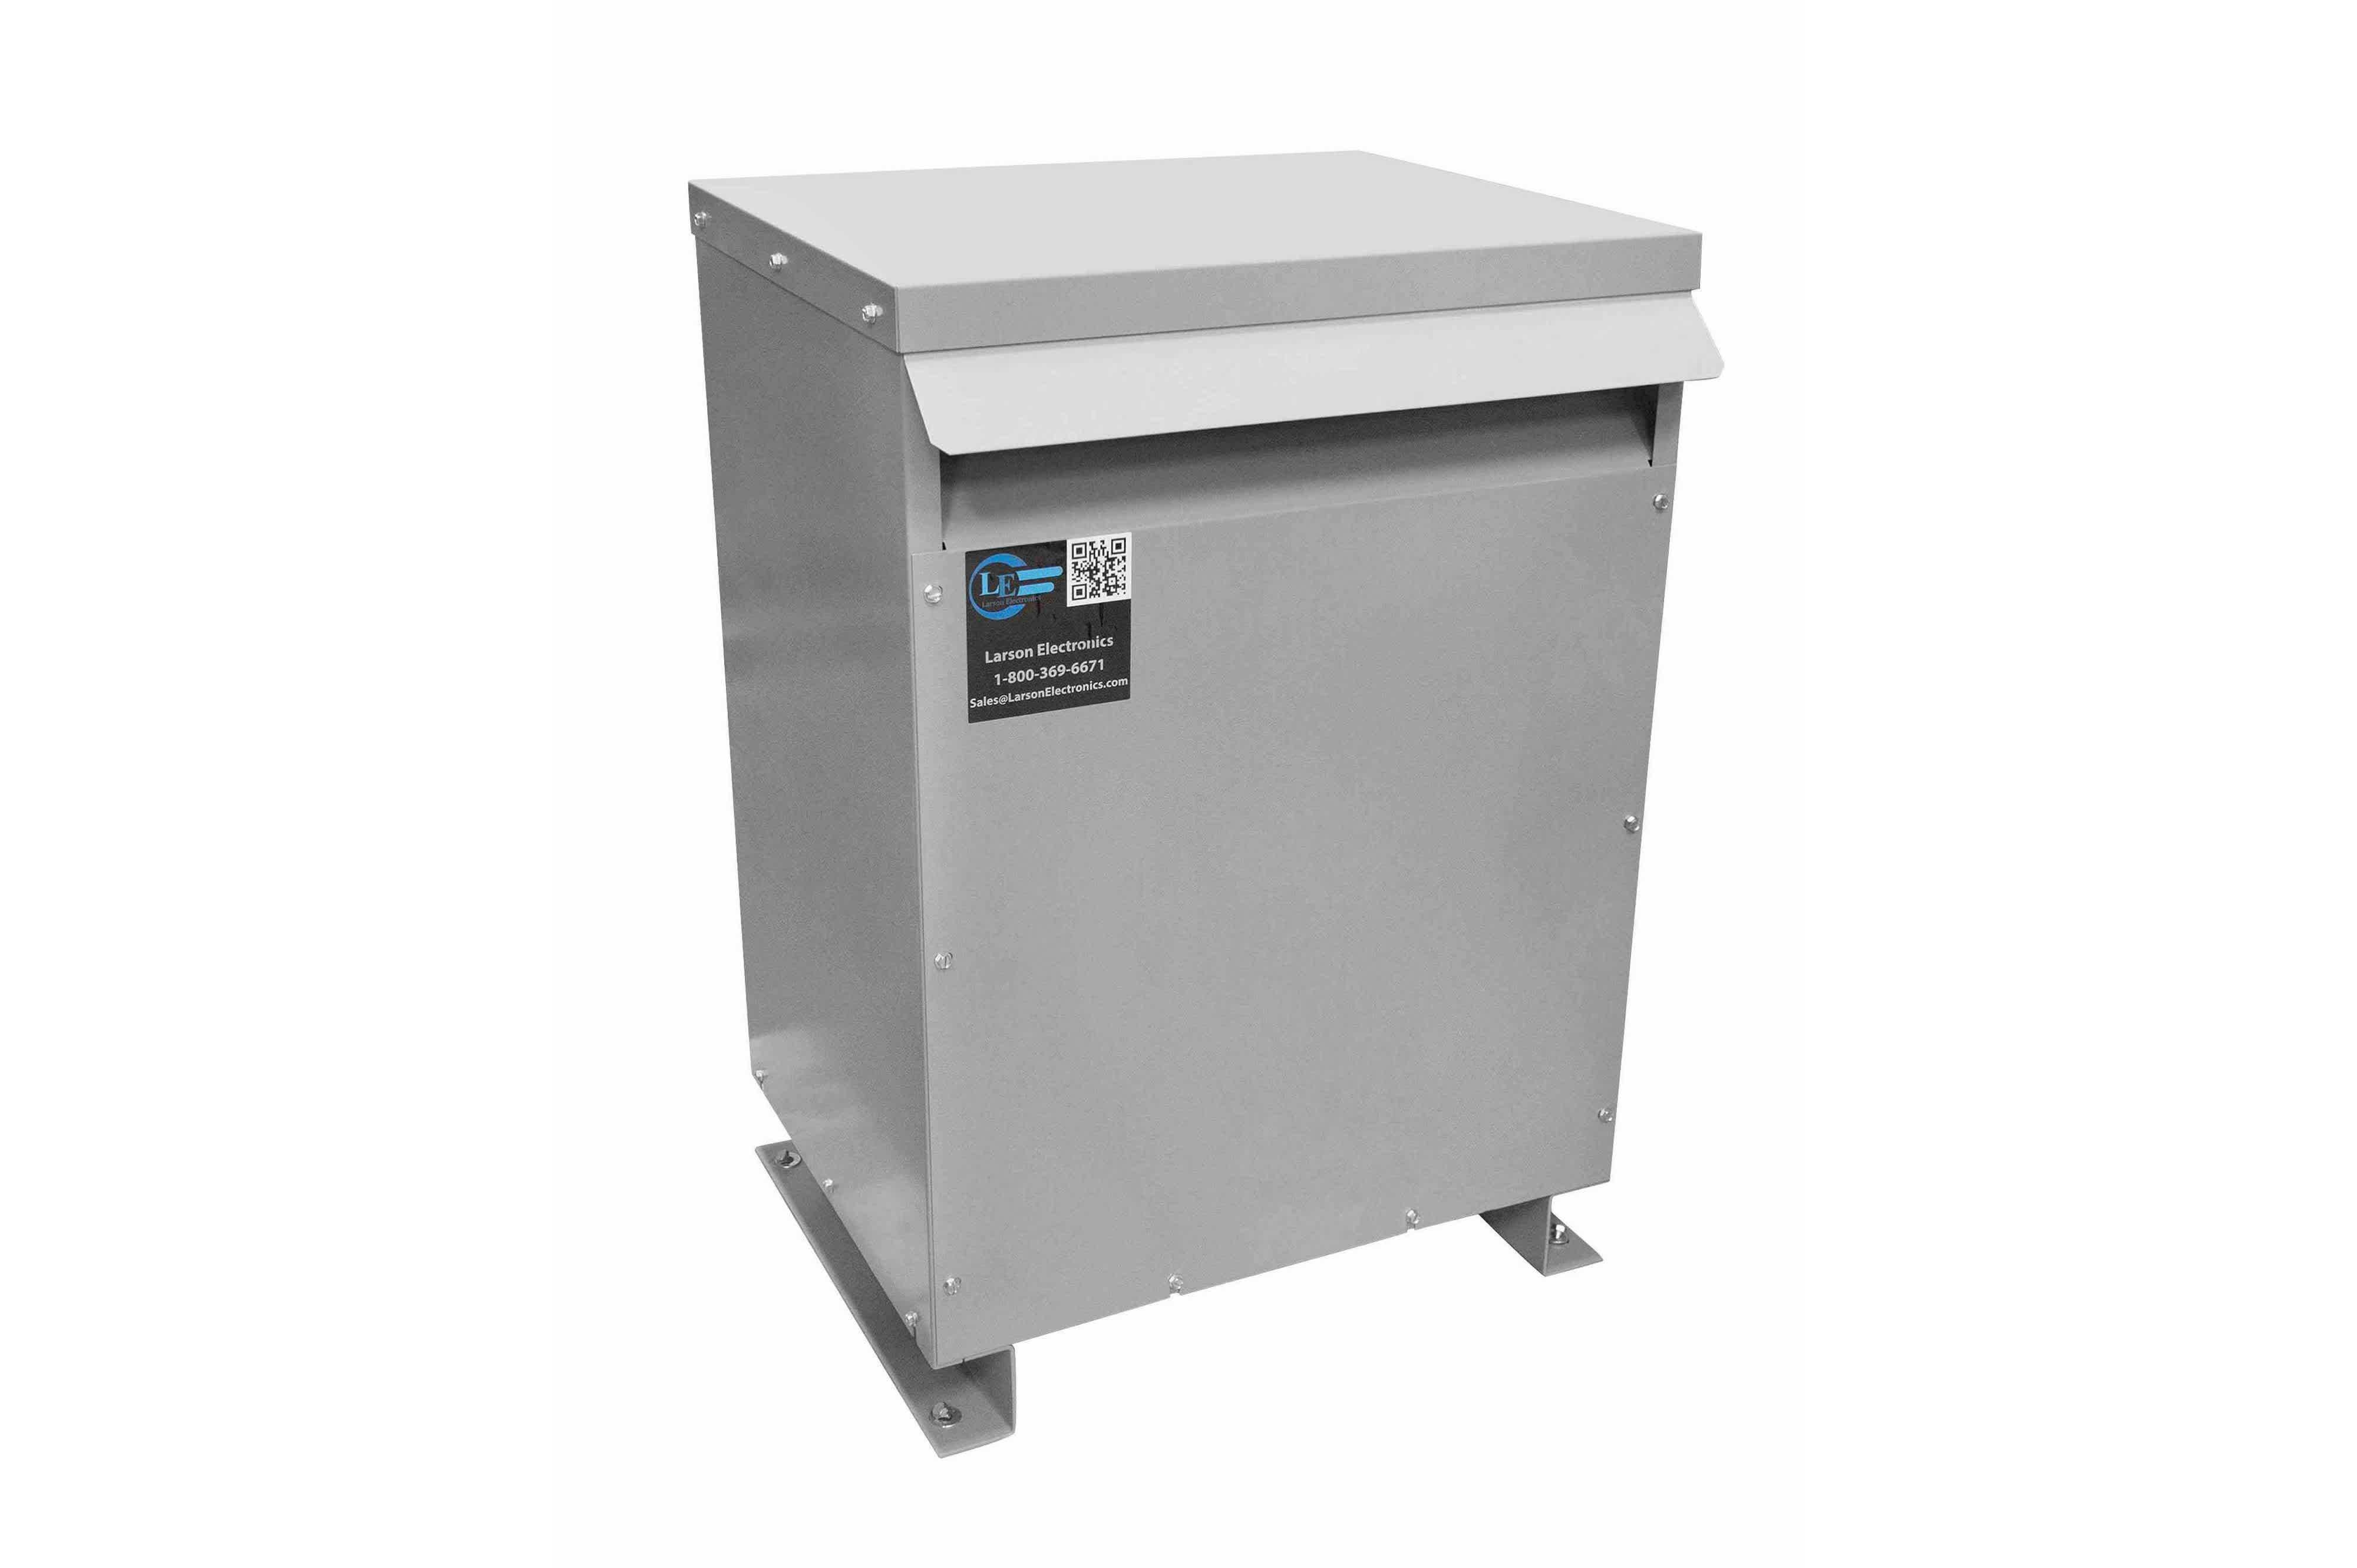 9 kVA 3PH Isolation Transformer, 460V Wye Primary, 415V Delta Secondary, N3R, Ventilated, 60 Hz